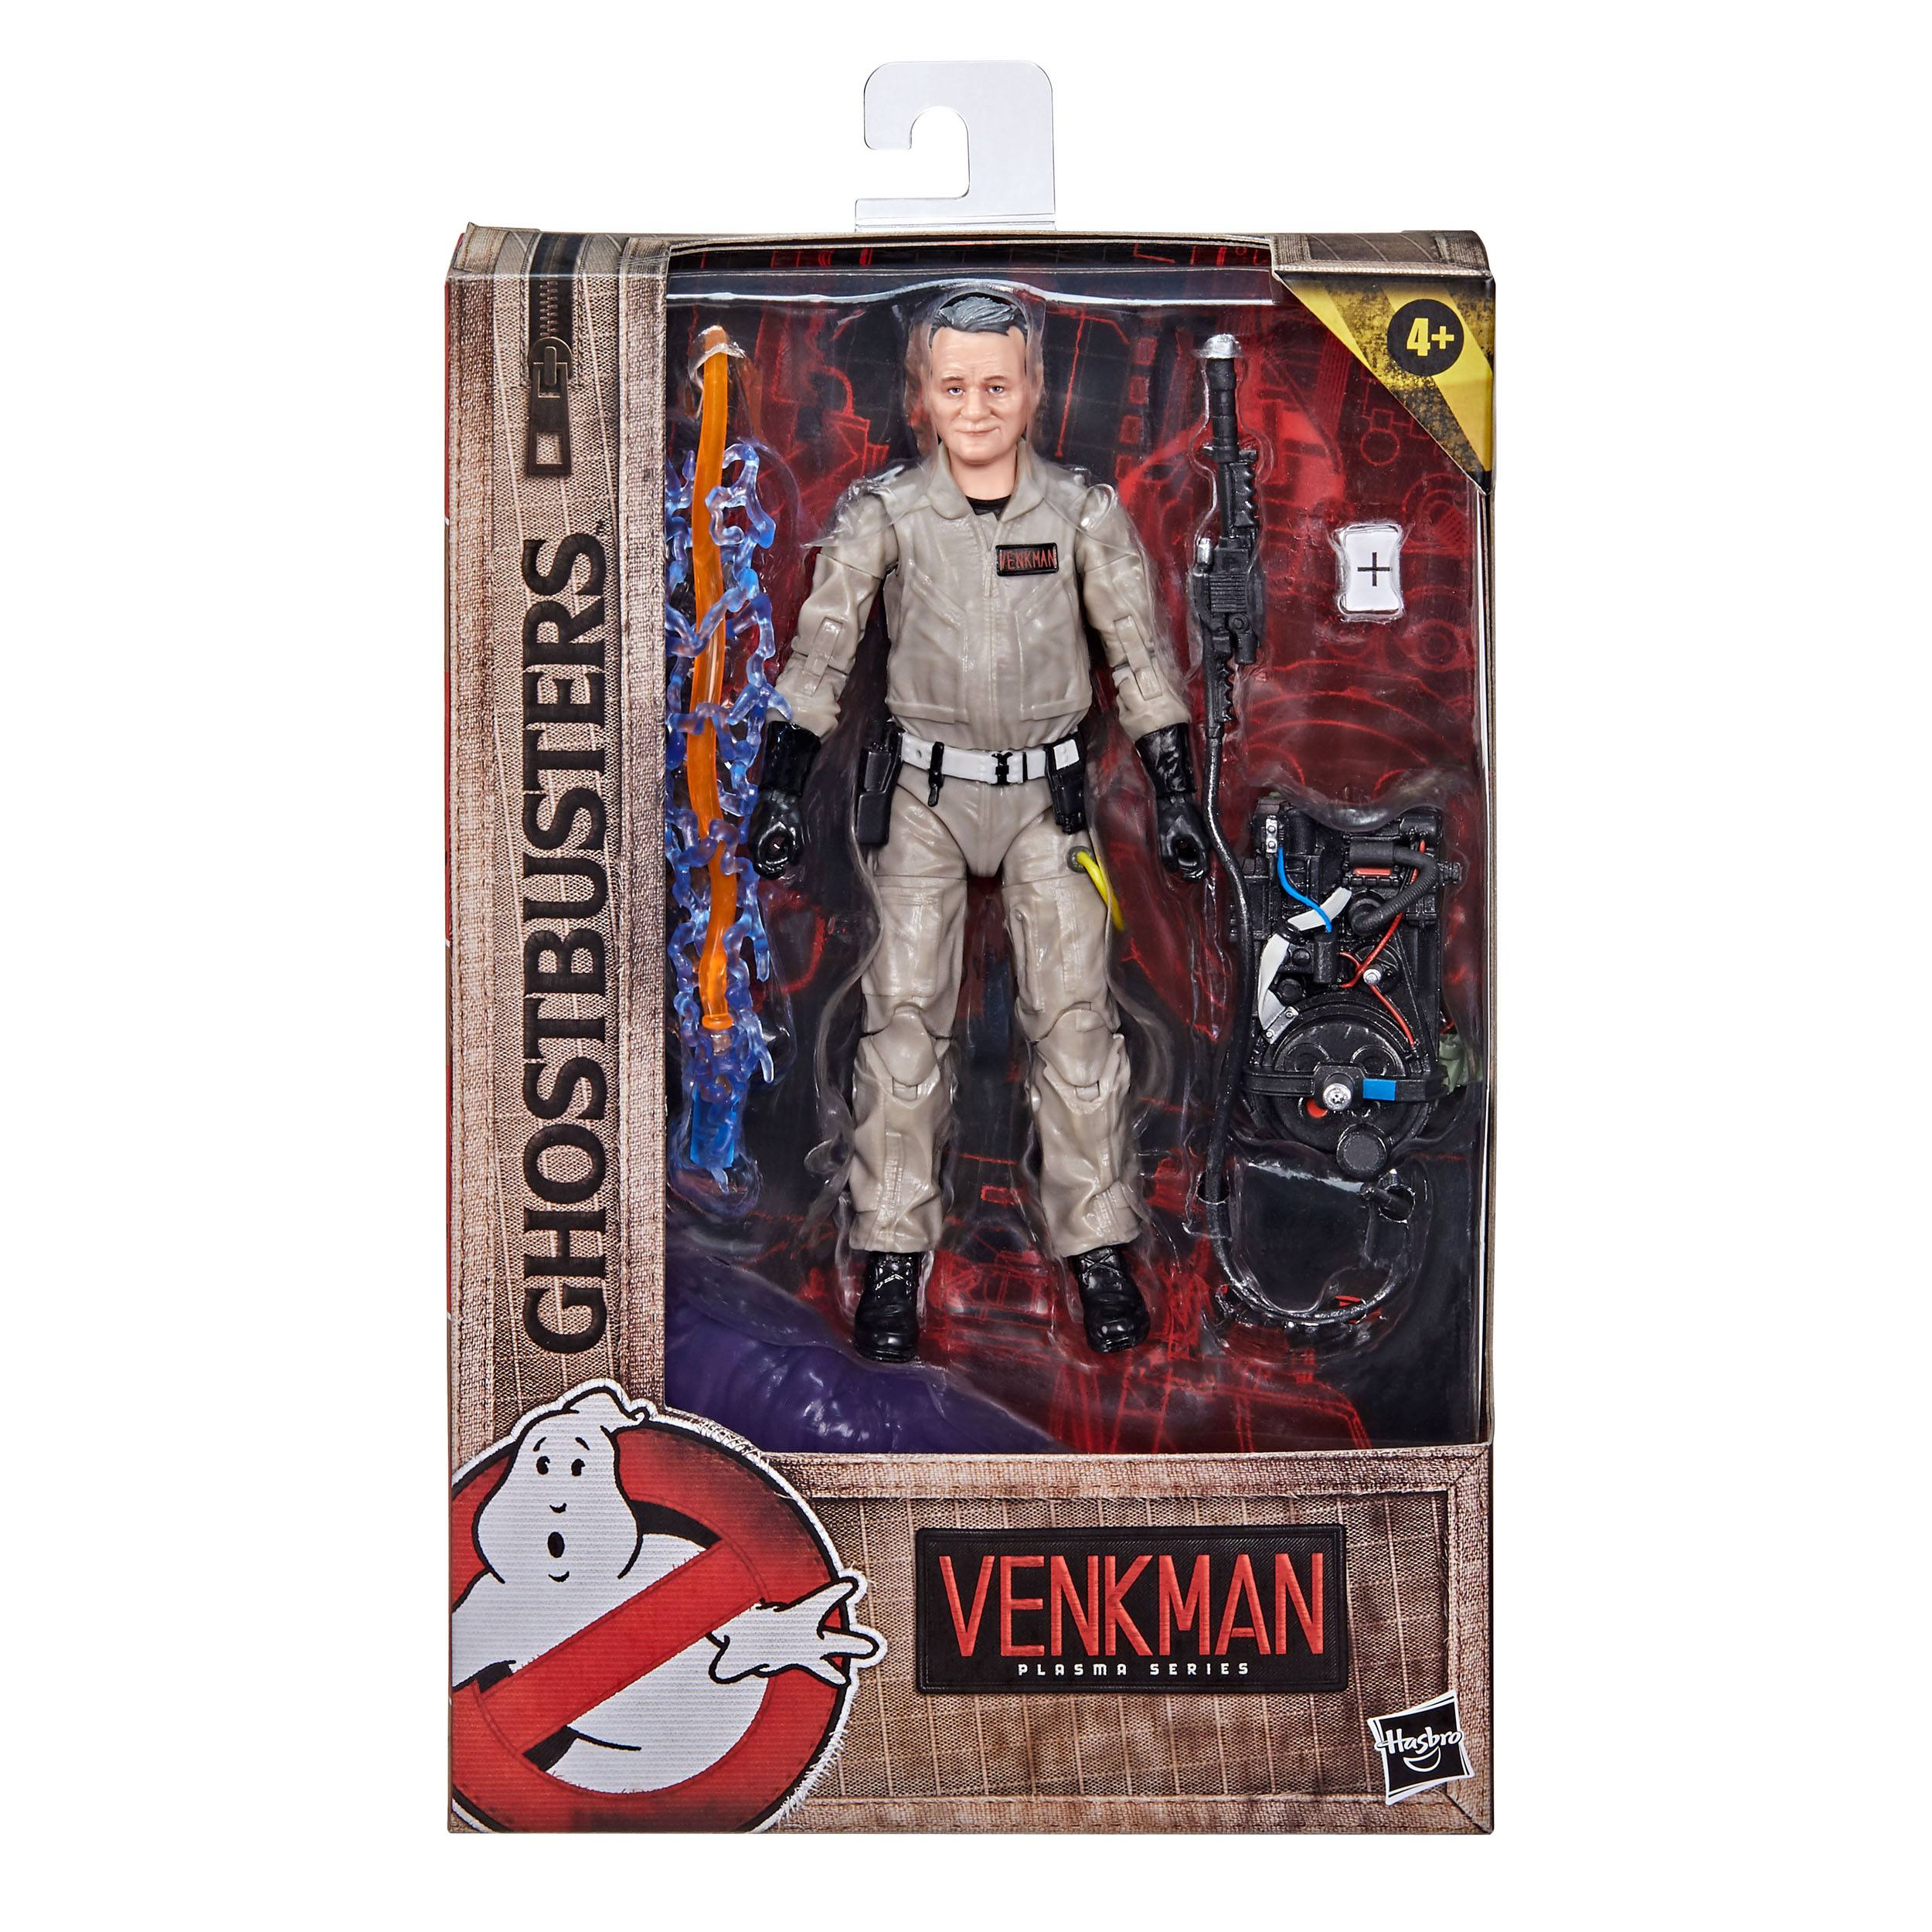 Ghostbusters Plasma Series Ghostbusters: Afterlife Afterlife Peter Venkman  5010993853311